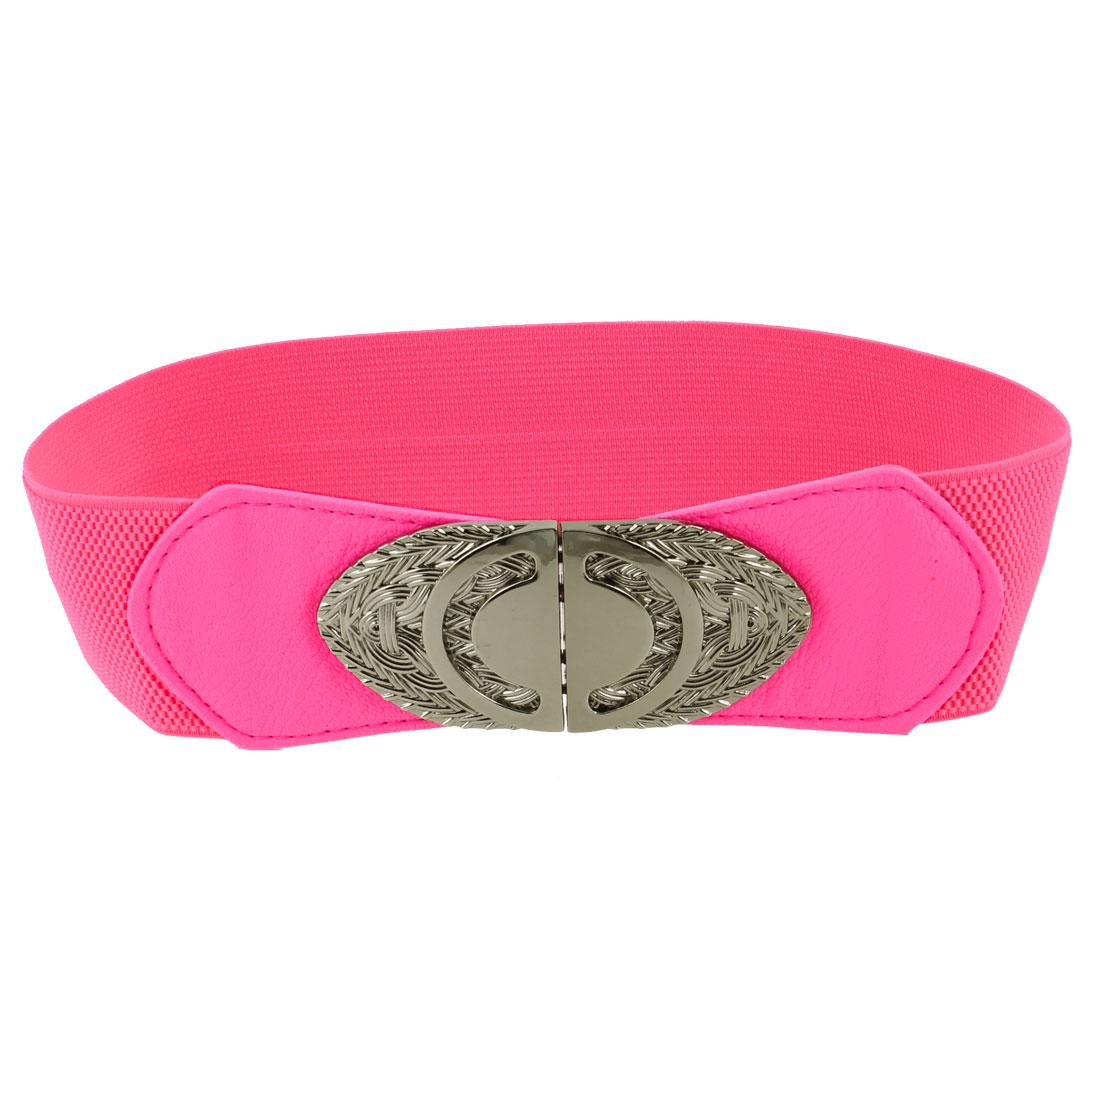 Lady Metal Interlocking Buckle Stretchy Waistbelt Cinch Belt Hot Pink